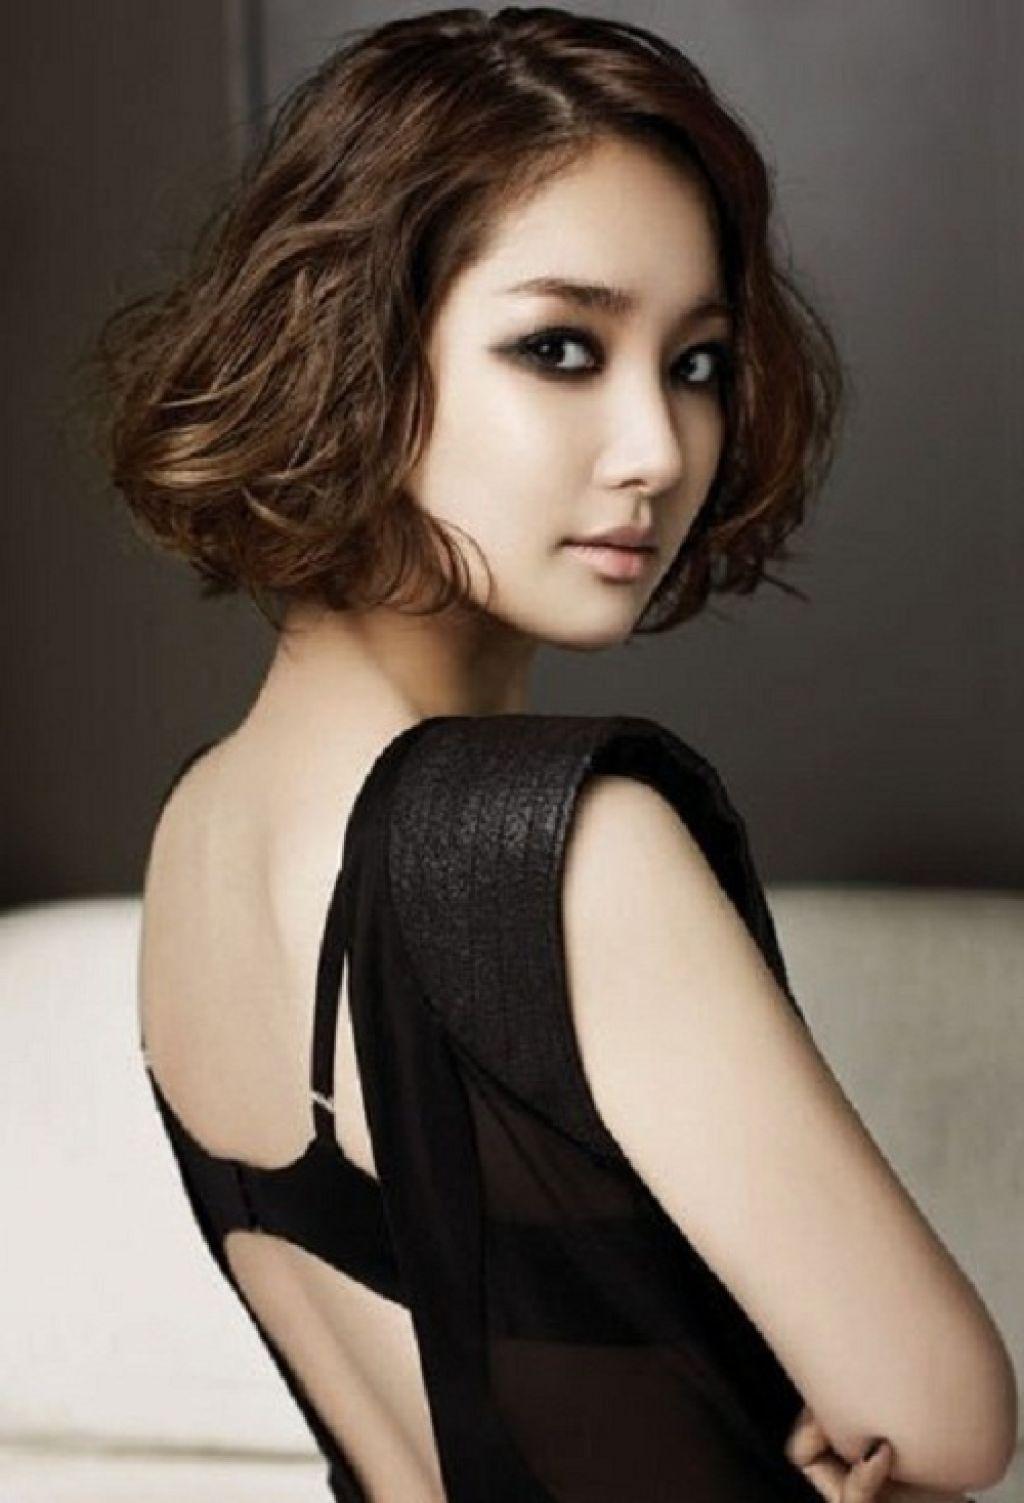 top-drawer asian short wavy hairstyles - wavy haircut